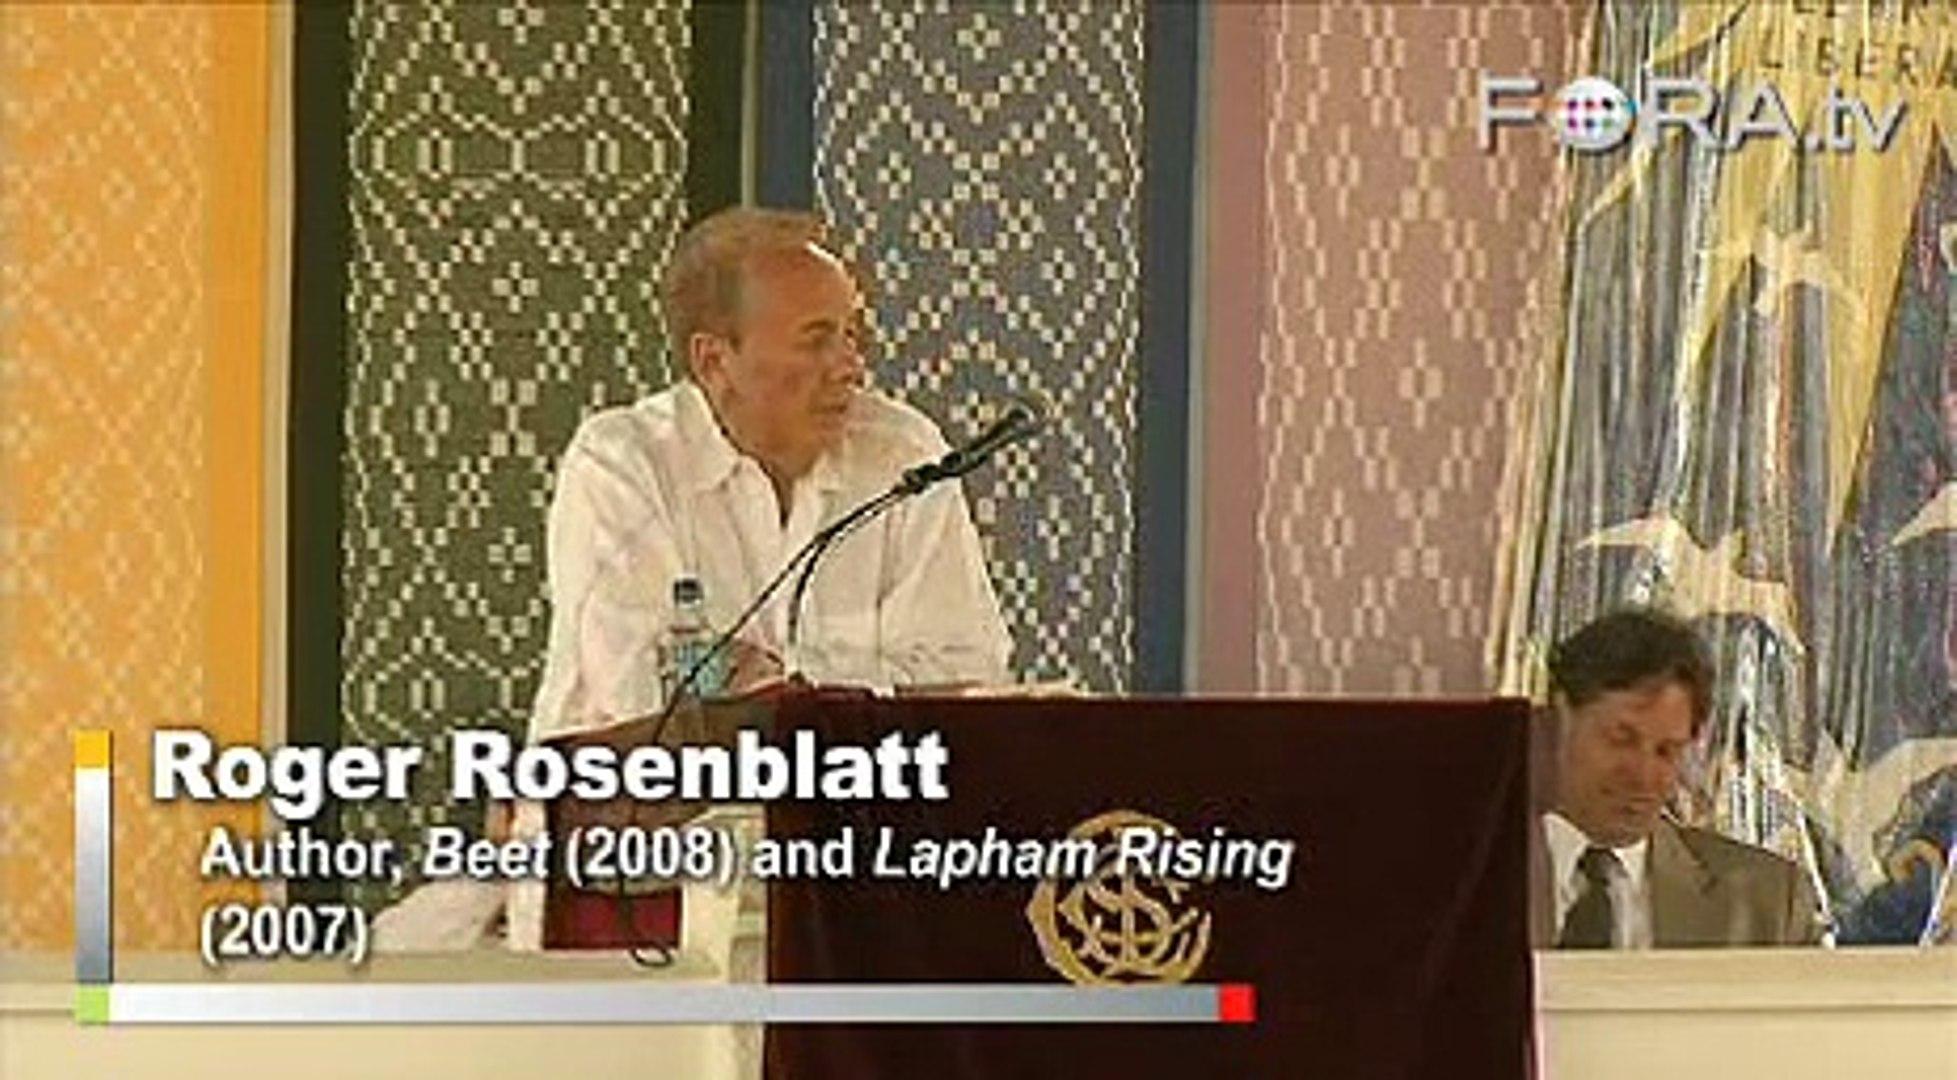 Roger Rosenblatt on the Odd Characters of Beet College